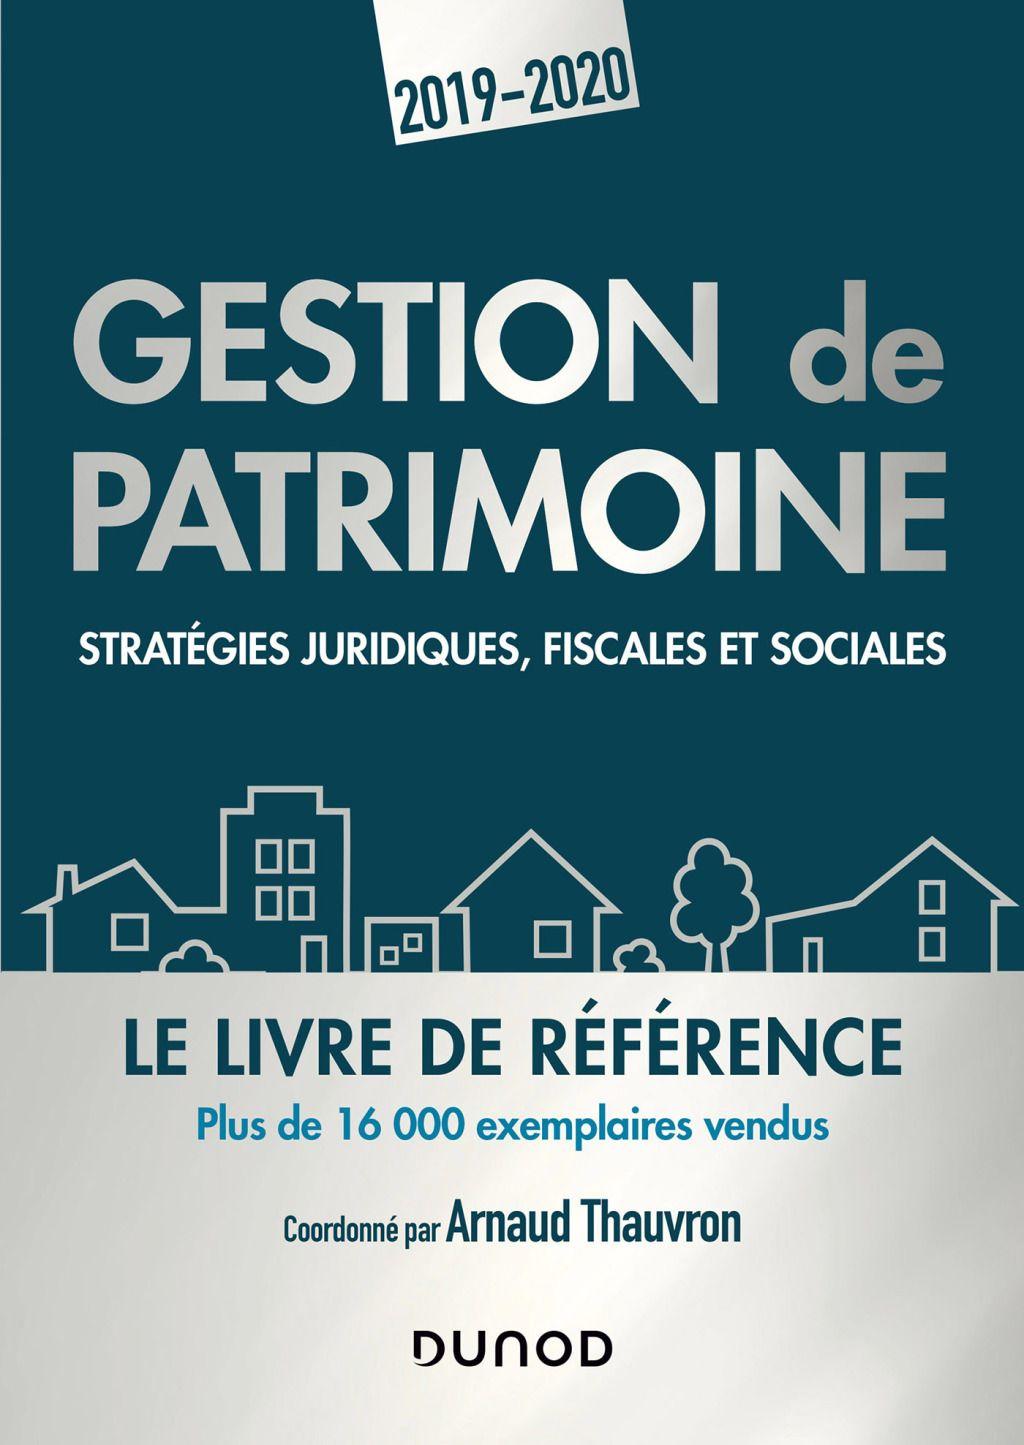 Gestion De Patrimoine 2019 2020 Ebook Professional Liability Book Marketing Books To Read